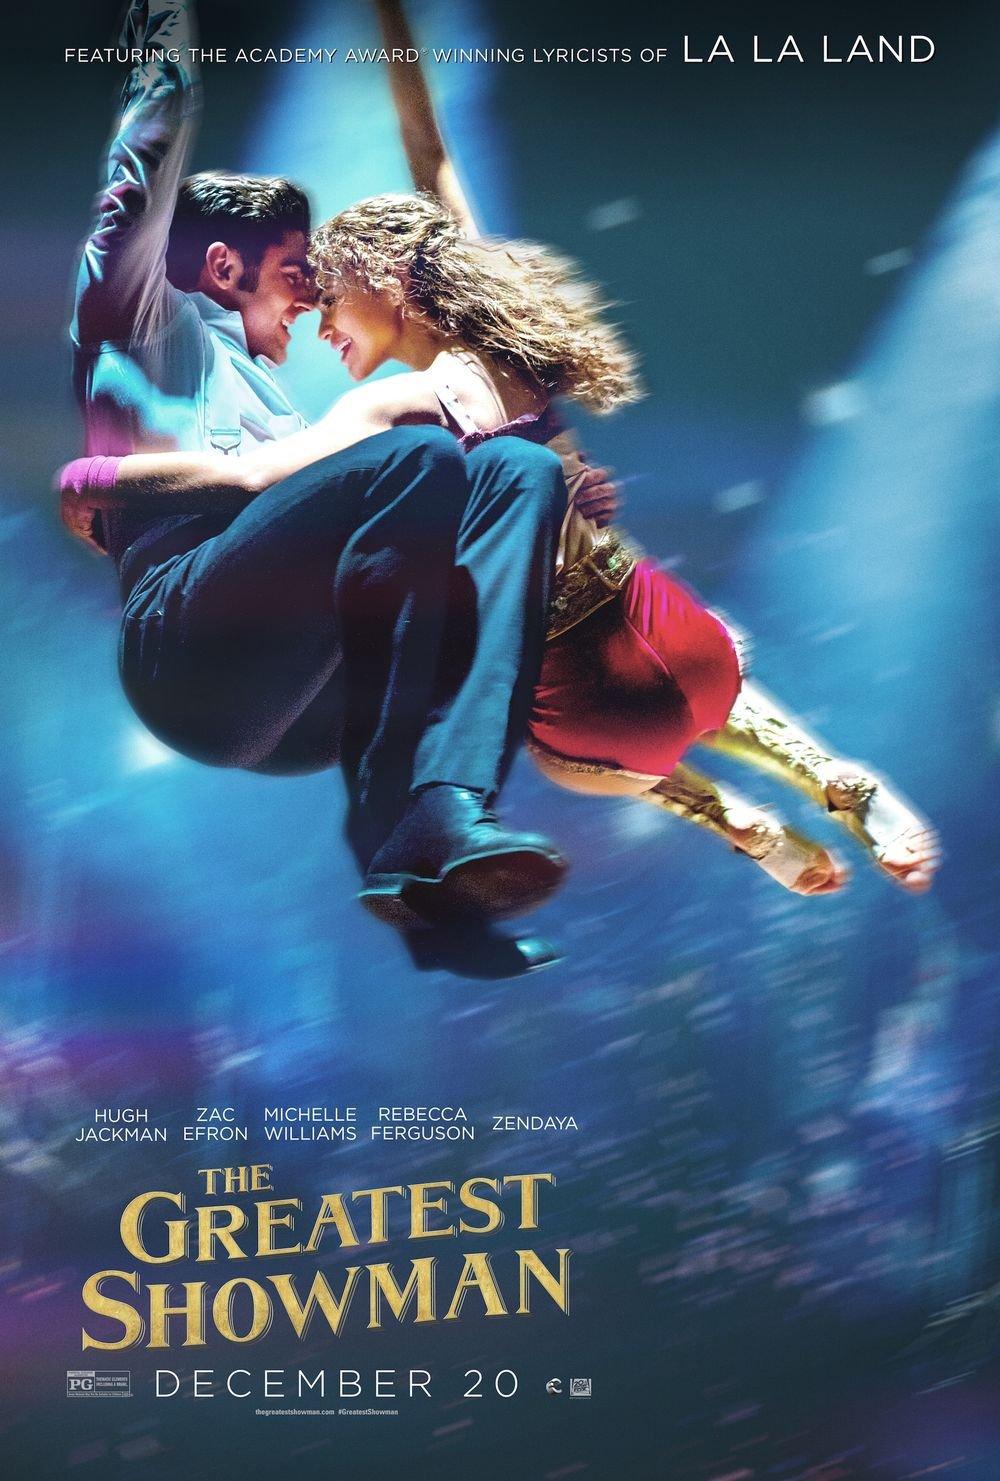 Poster The Greatest Showman Movie 70 X 45 cm: Amazon.es: Hogar